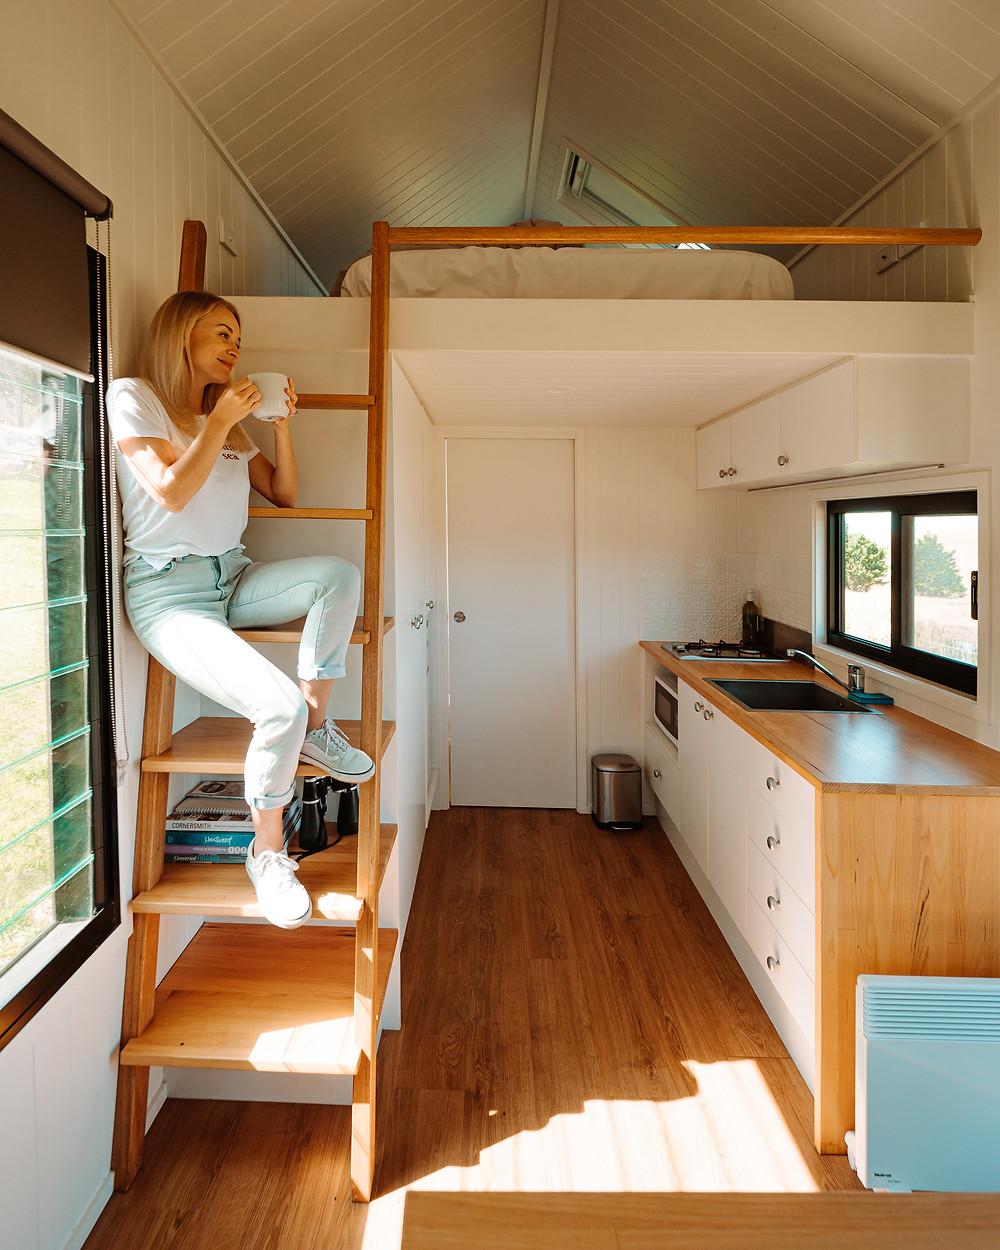 Tiny home experience in Tilba Tilba, Sapphire Coast NSW